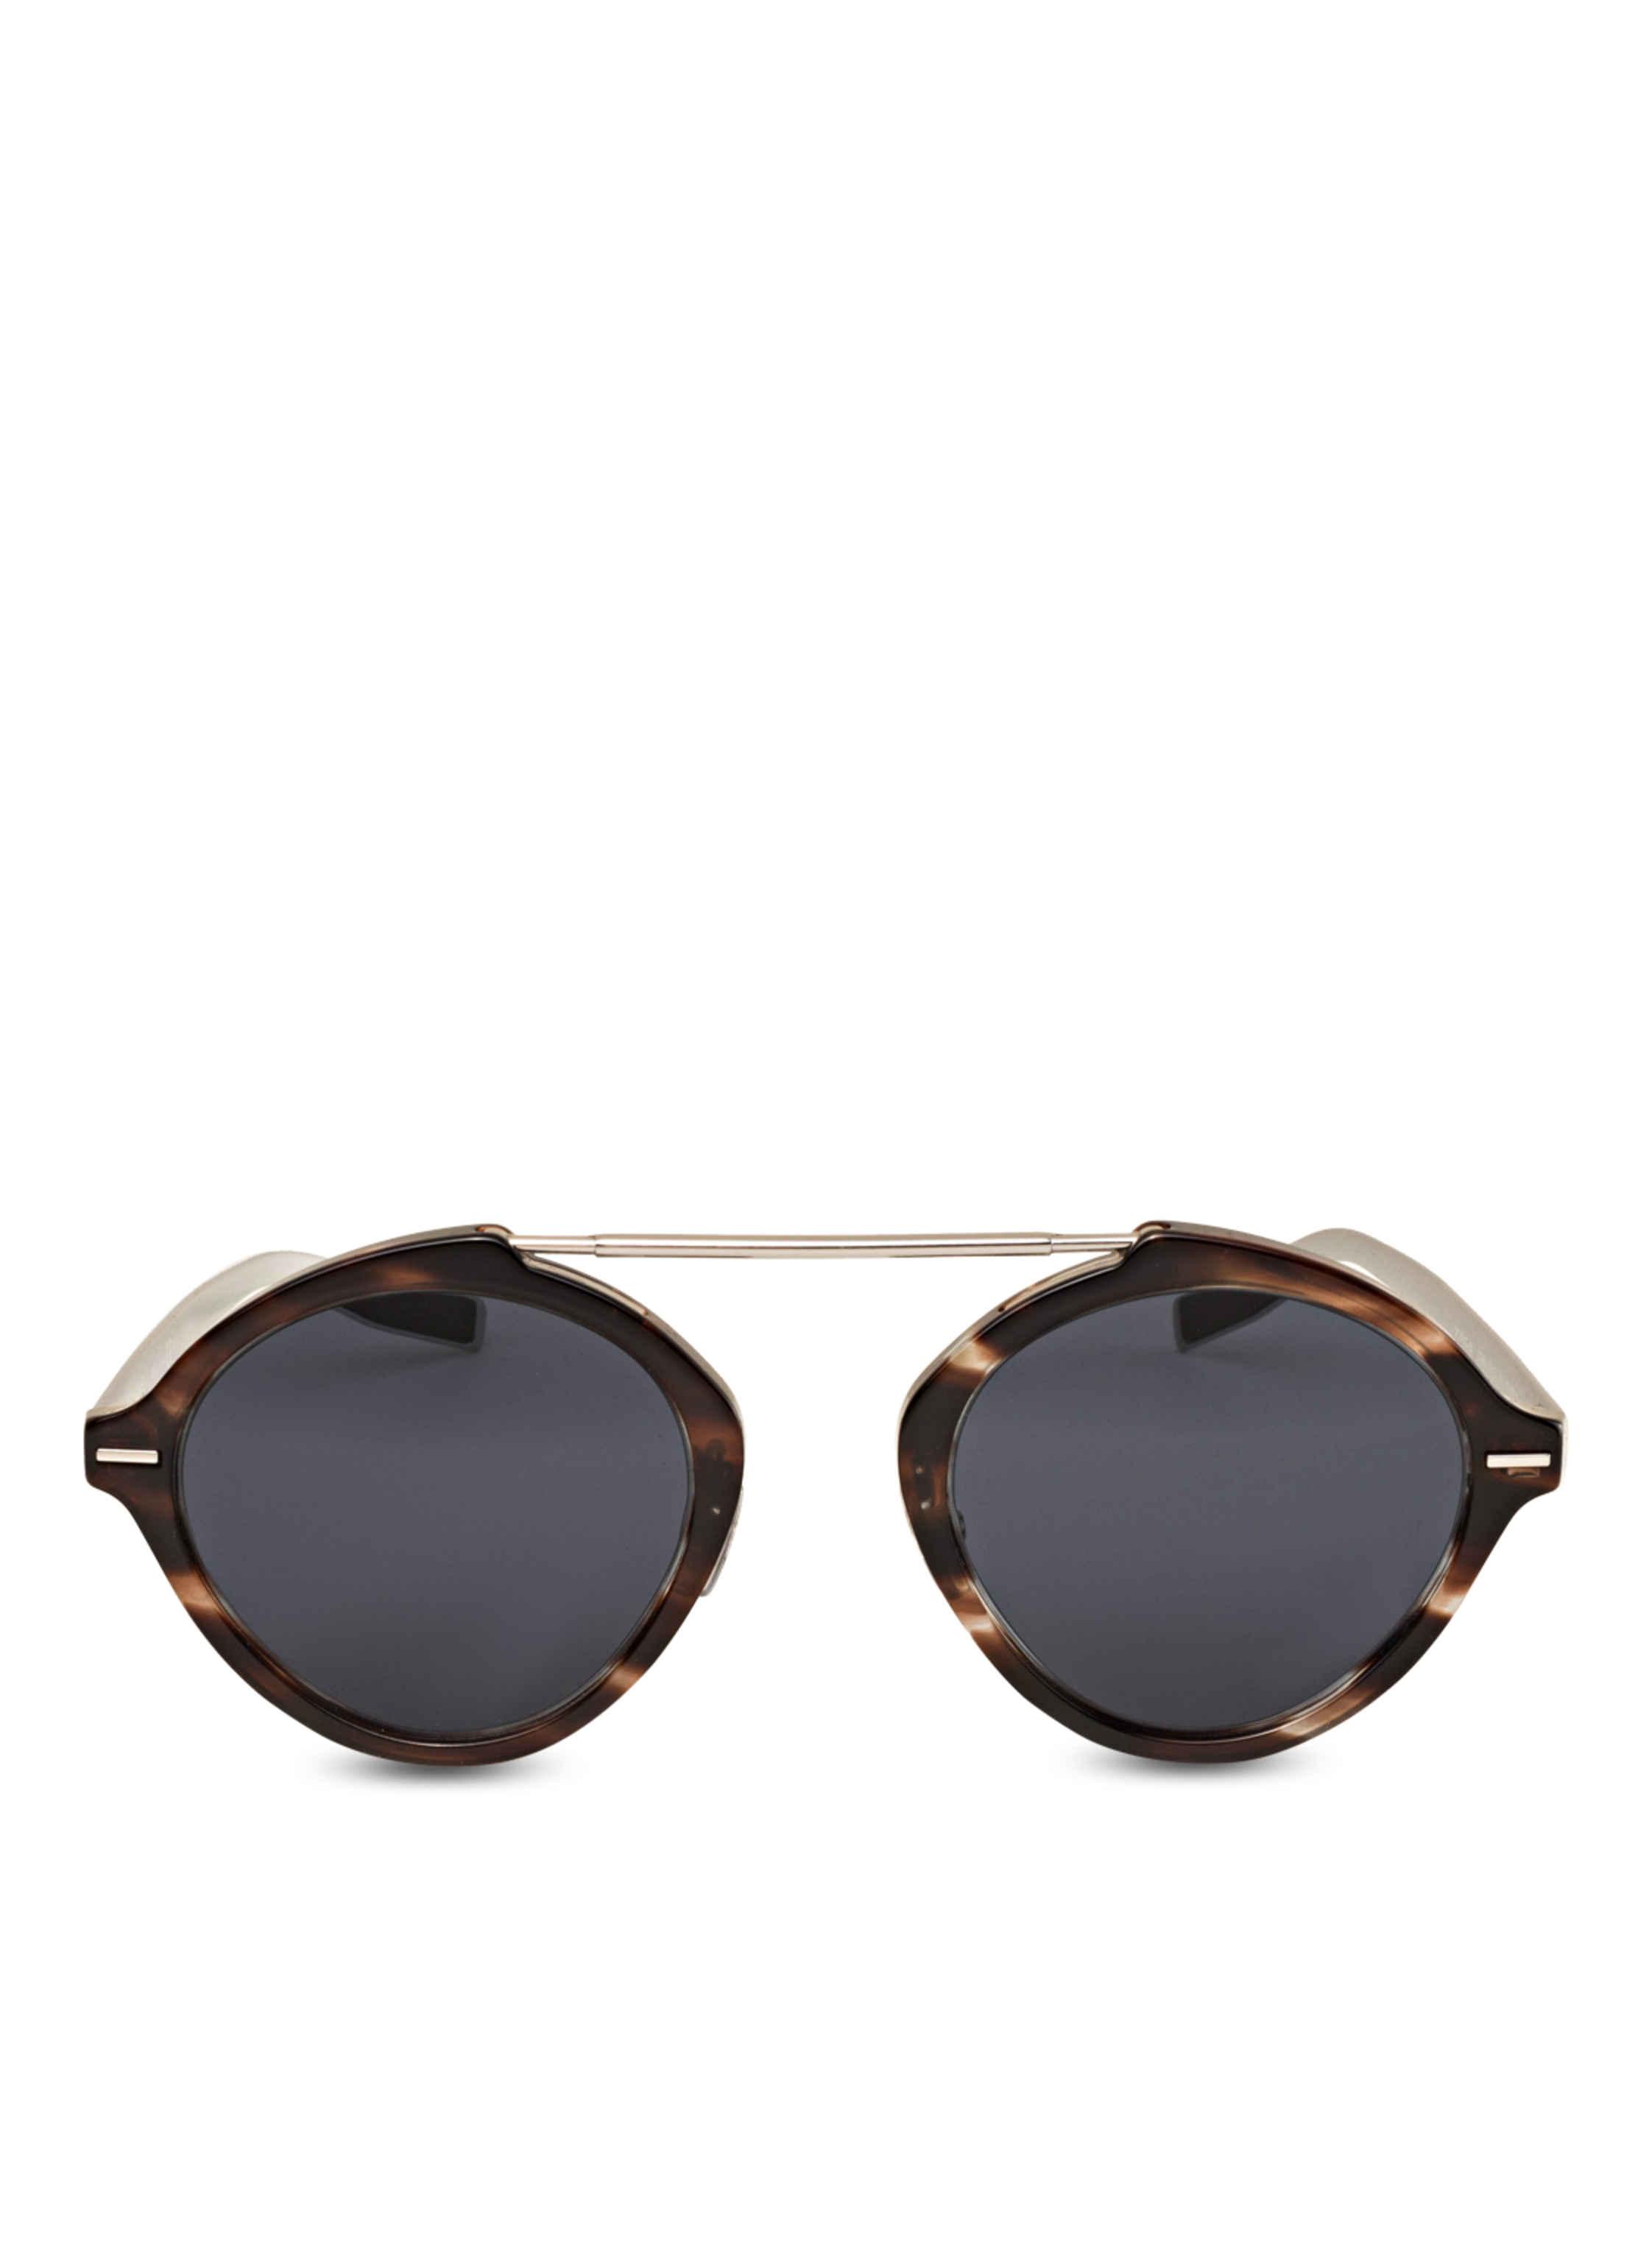 Dior Sunglasses Sonnenbrille DIORTAILORING1 qnWITaoTaC